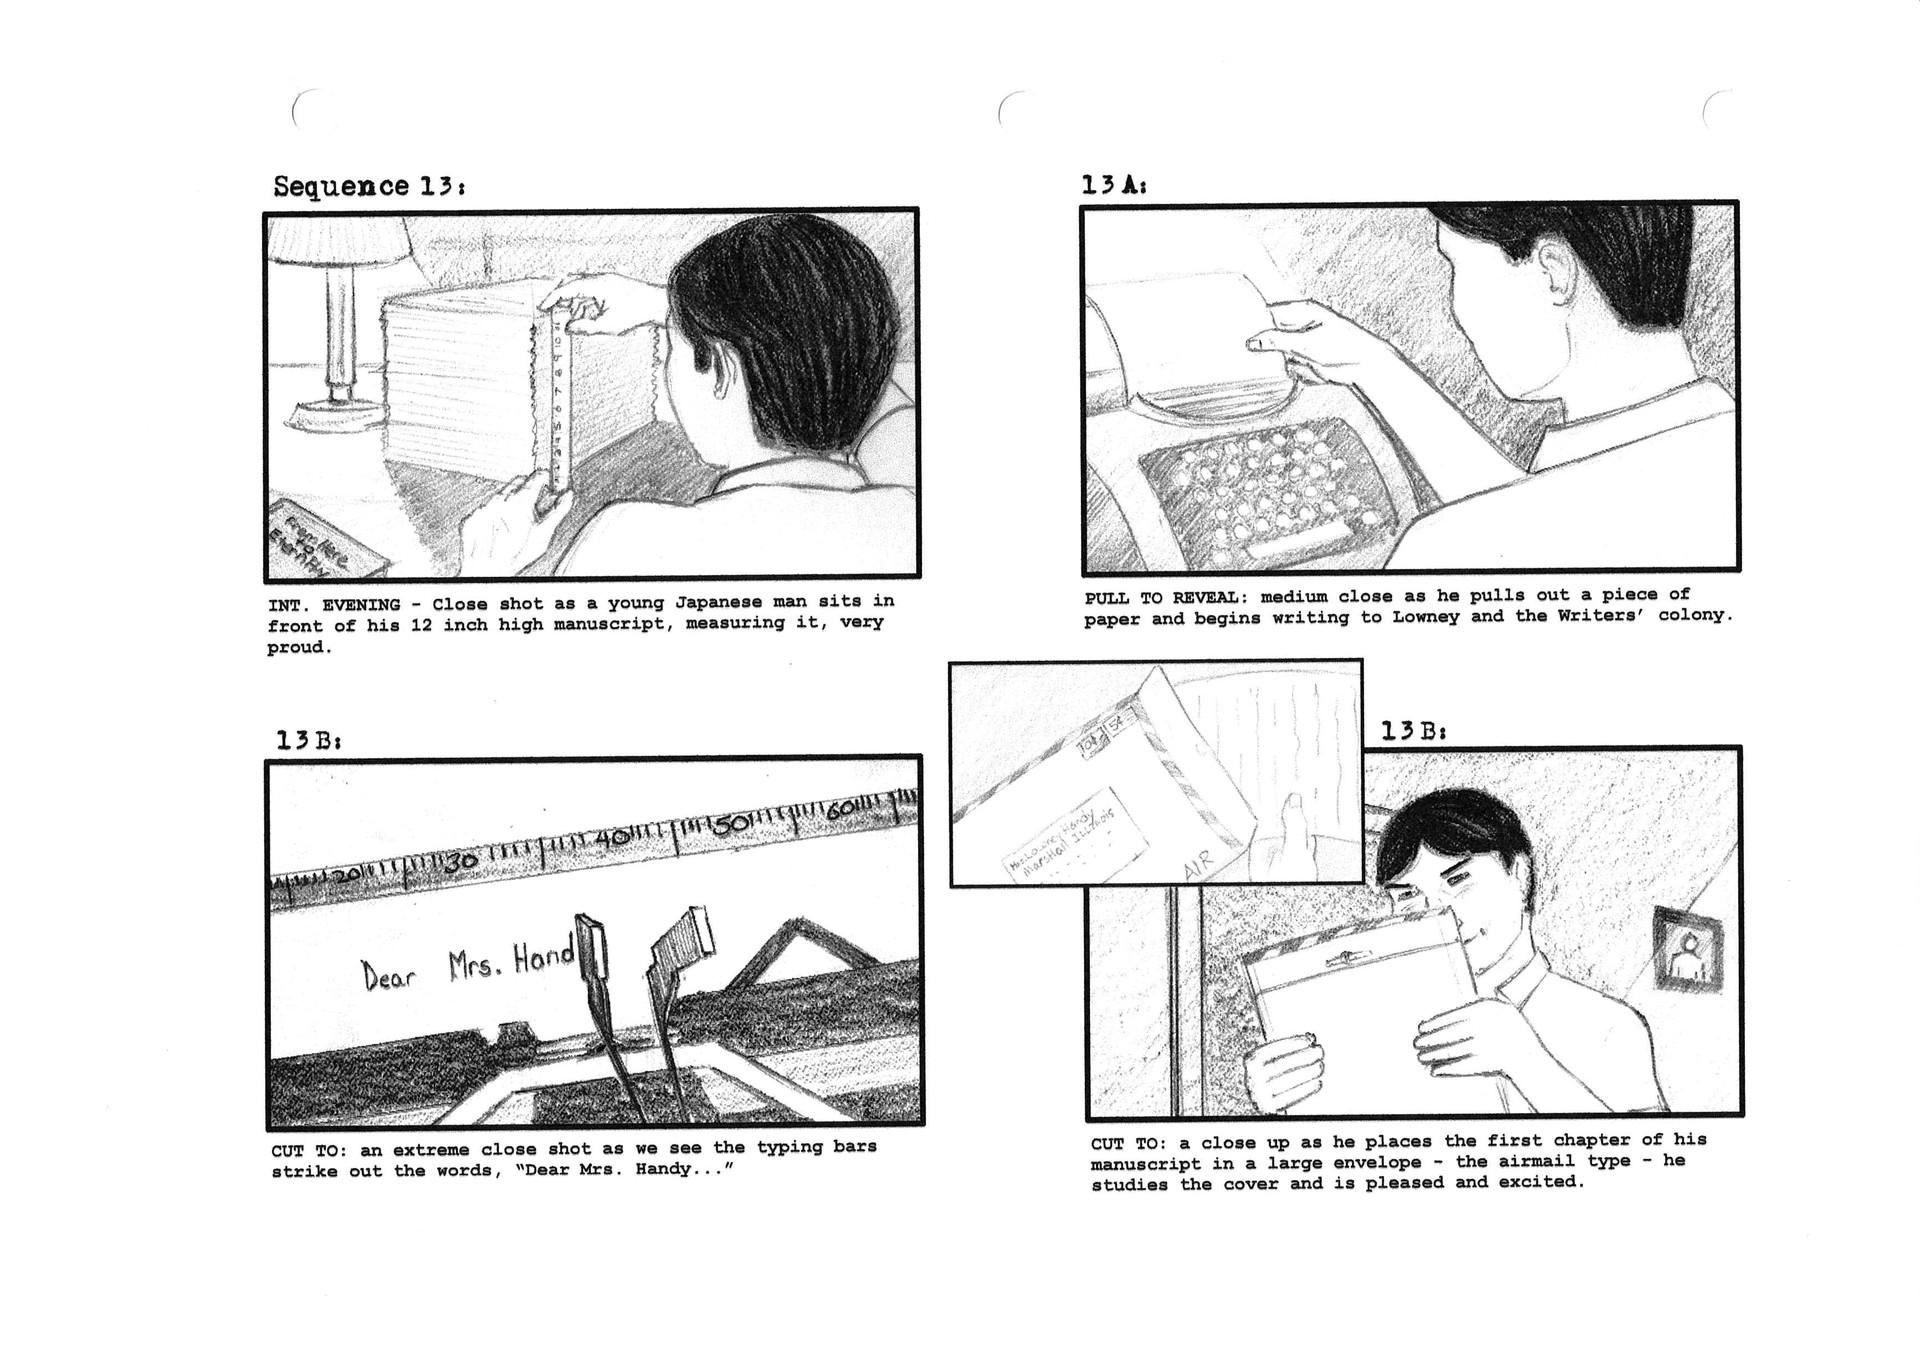 Dwayne stacho tlhwc storyboards 12